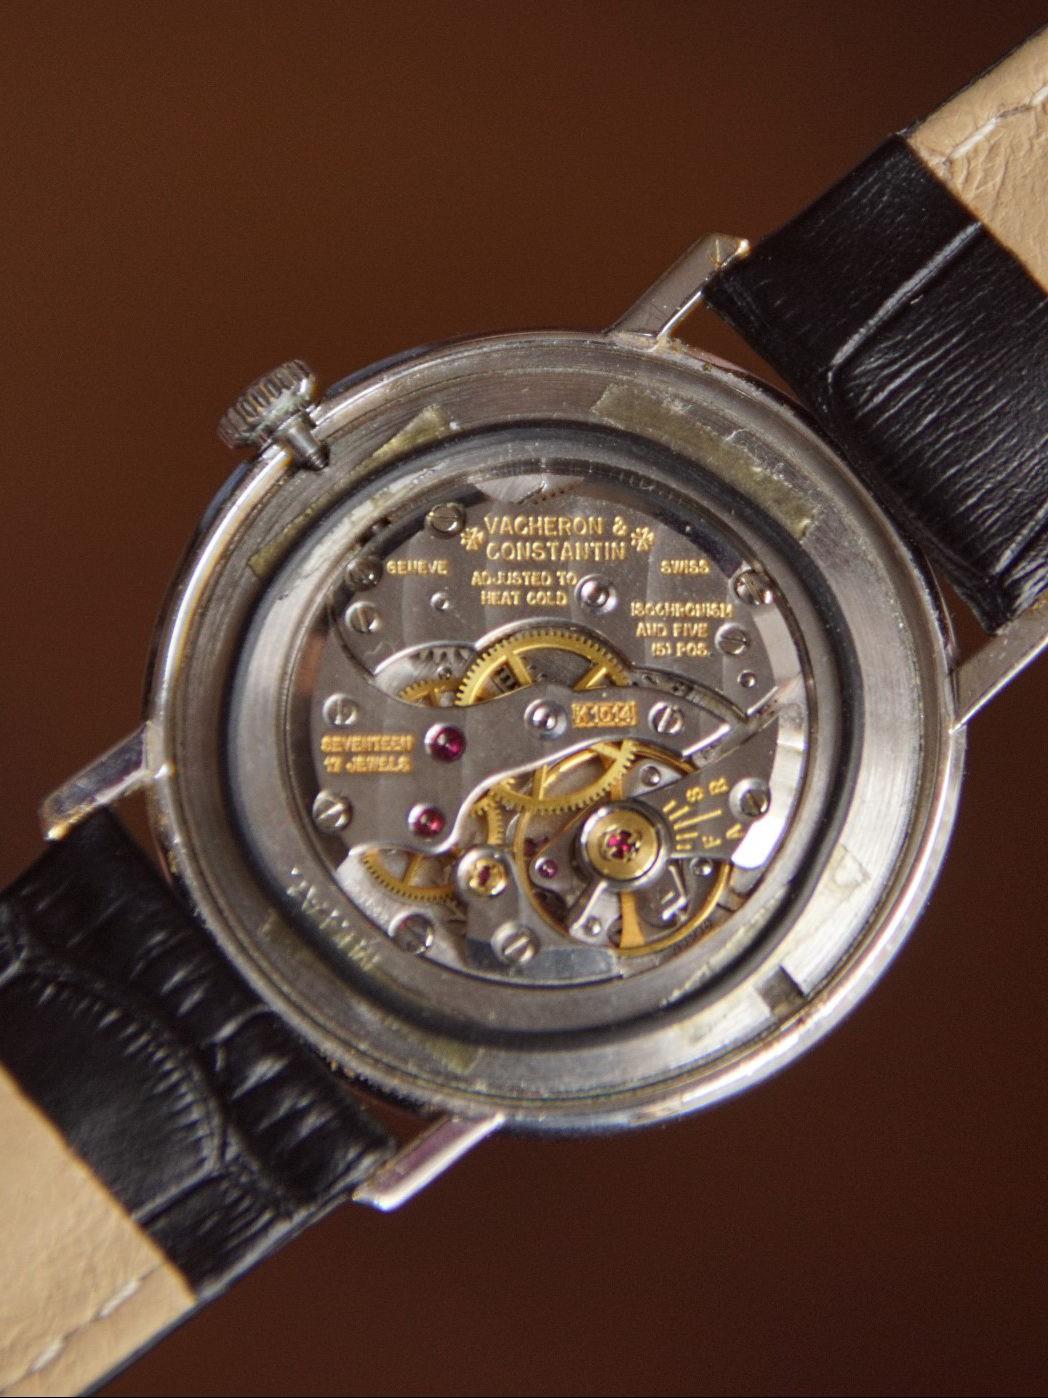 Vacheron Constantin K 1014